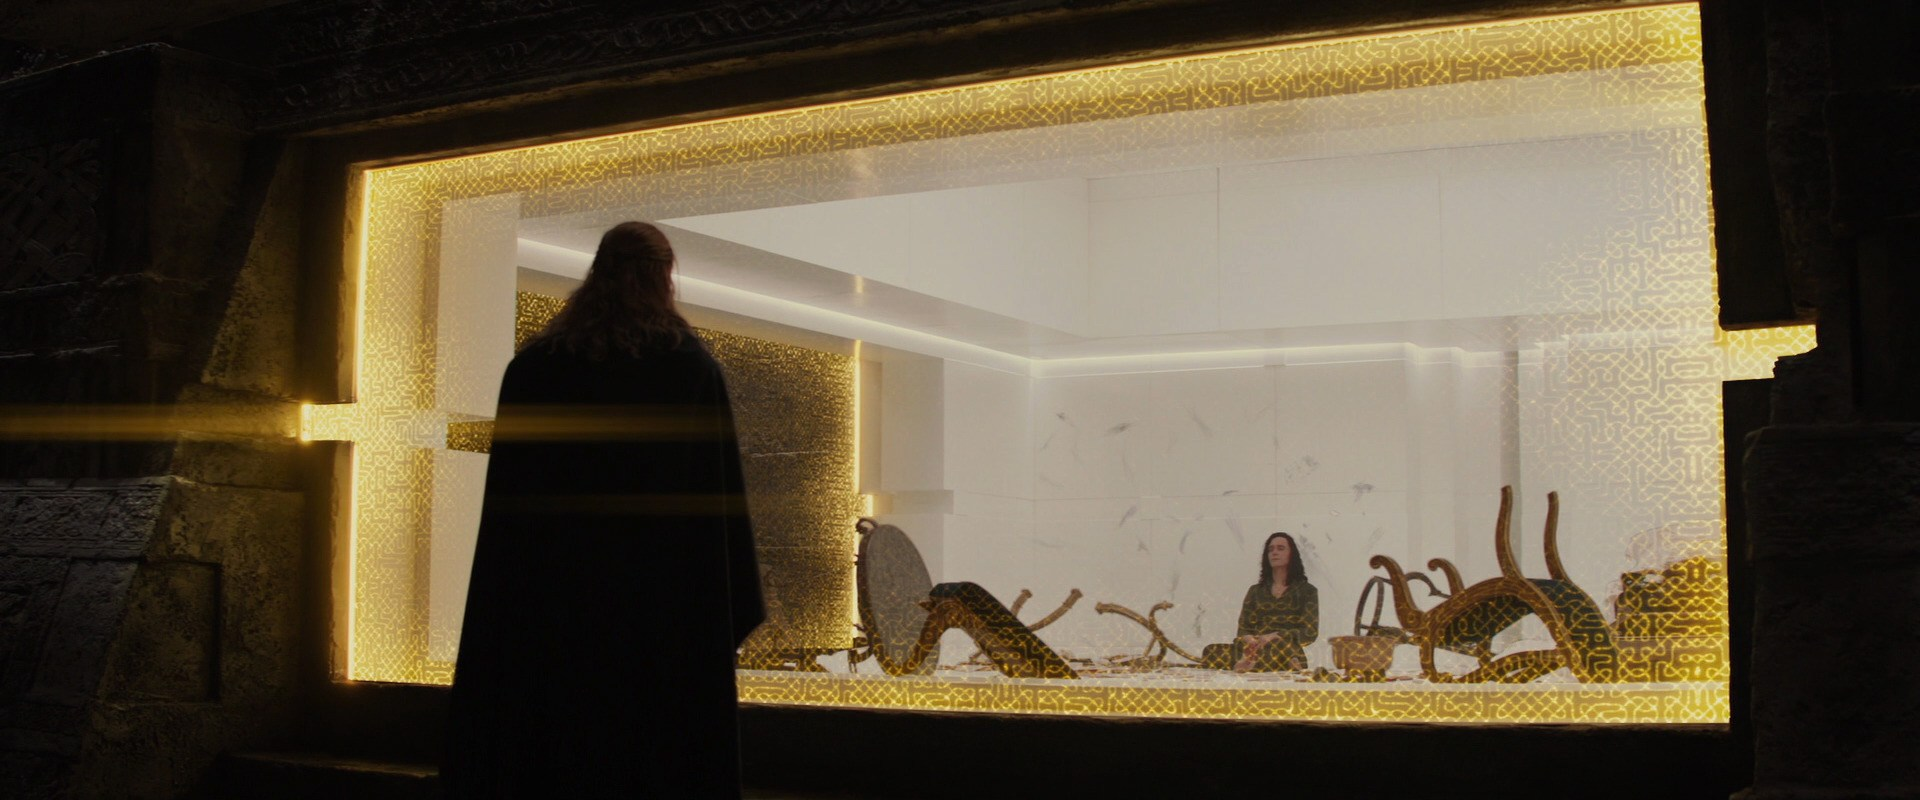 thor-dark-world-movie-screencaps.com-6903.jpg